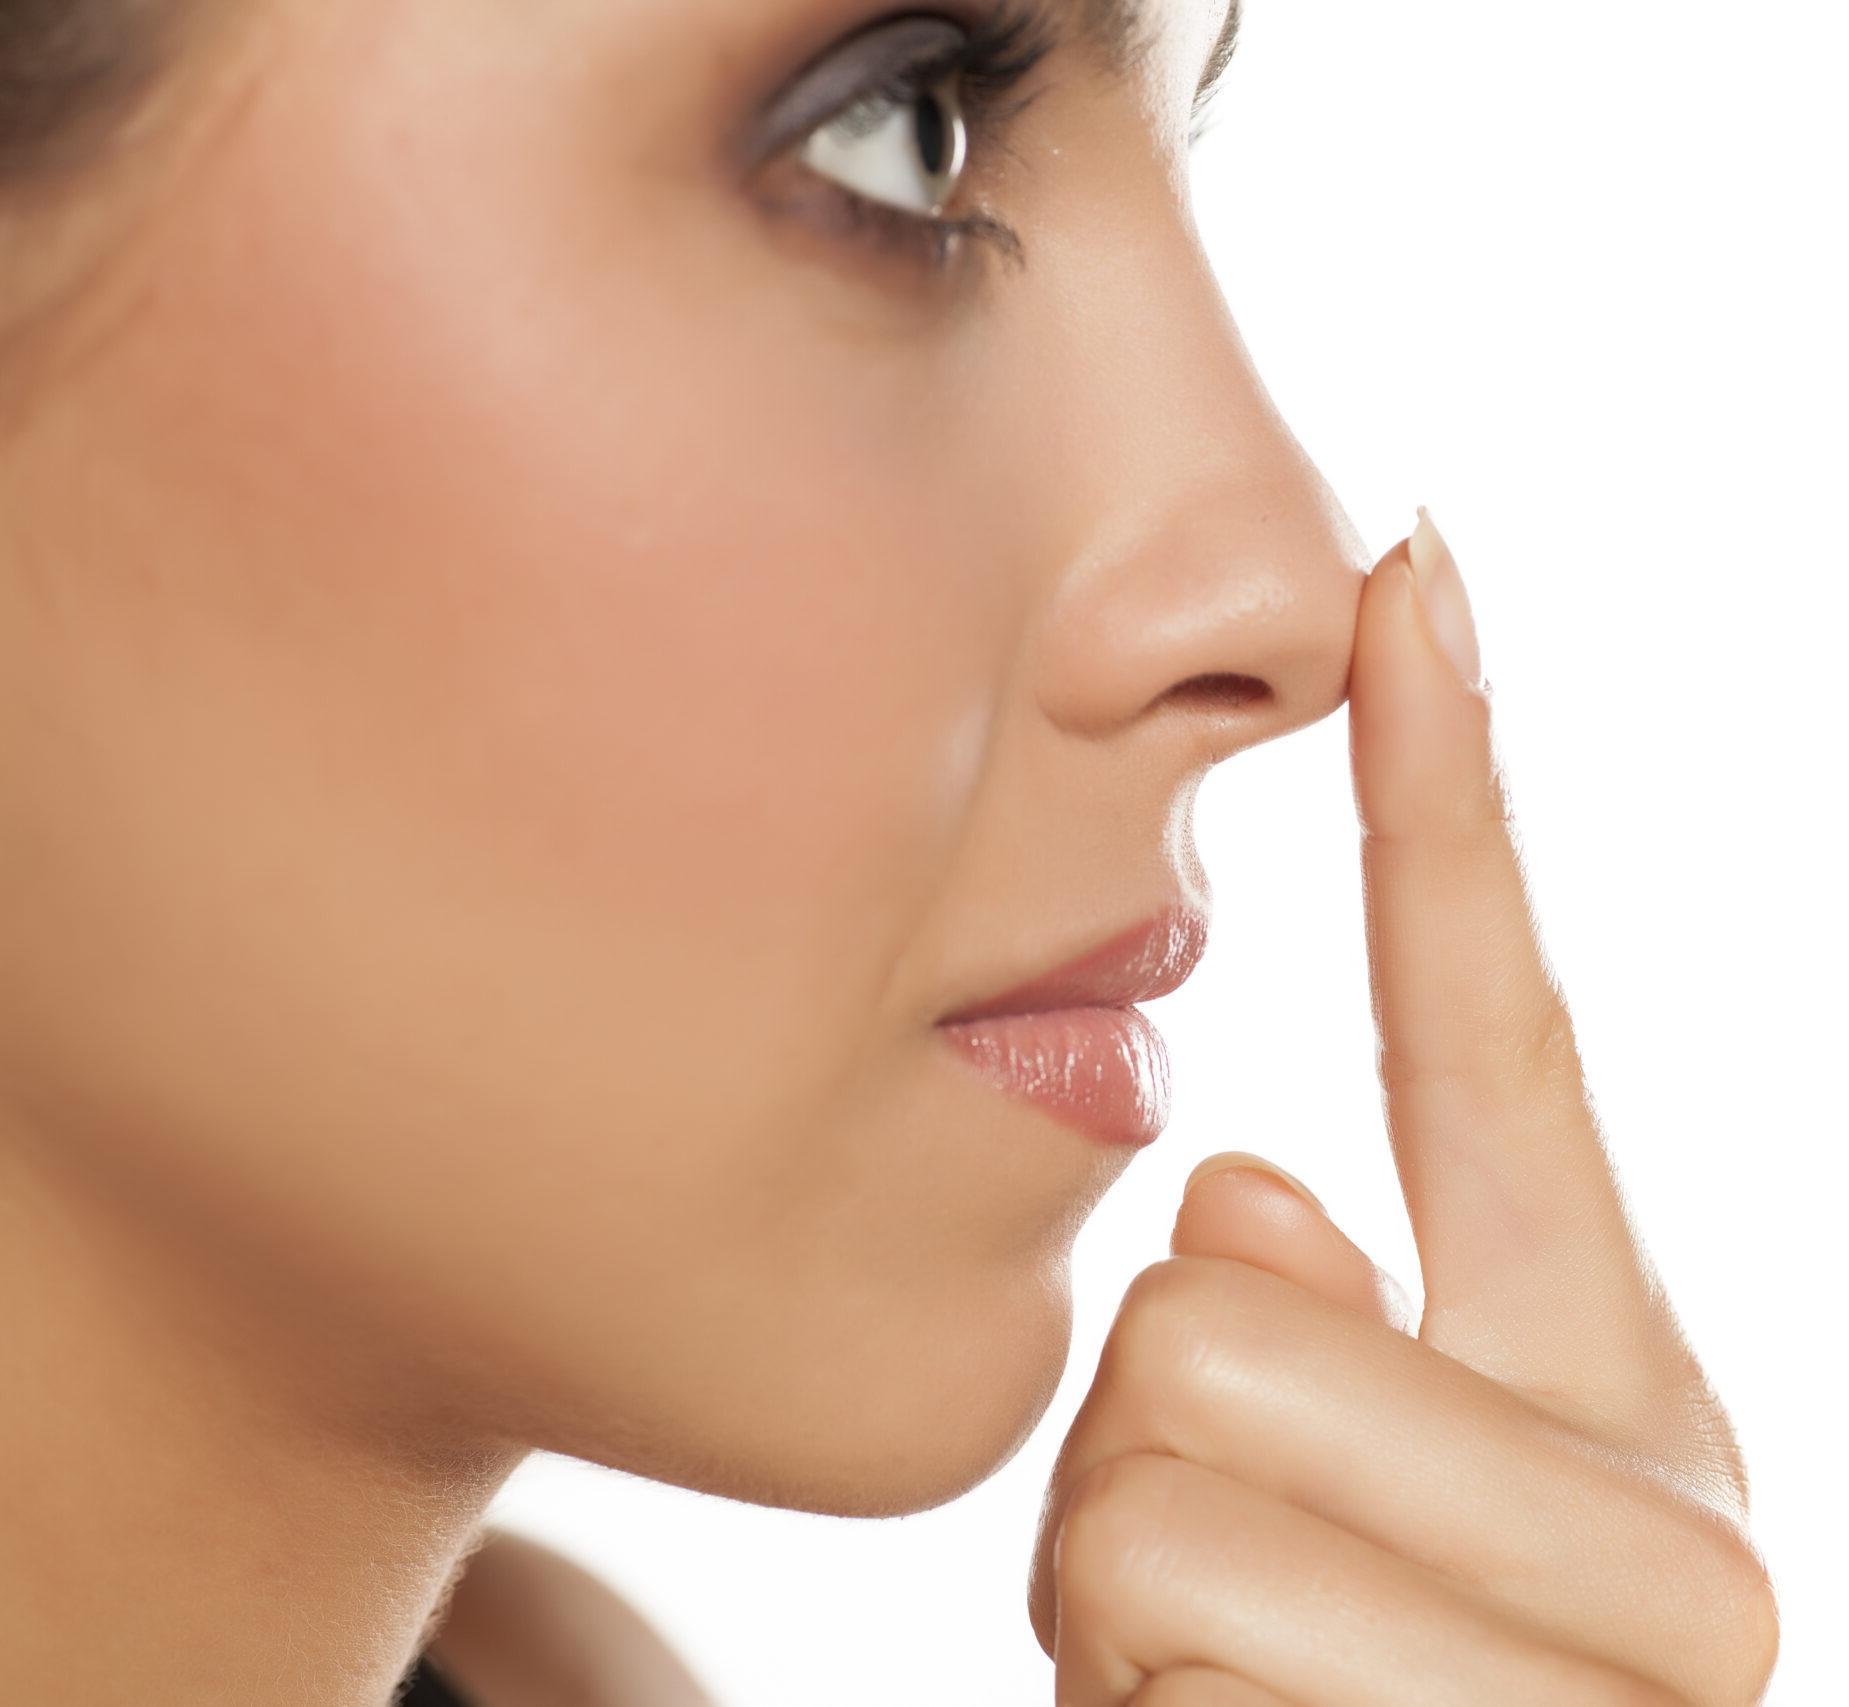 Nose re shaping Rhinoplasty